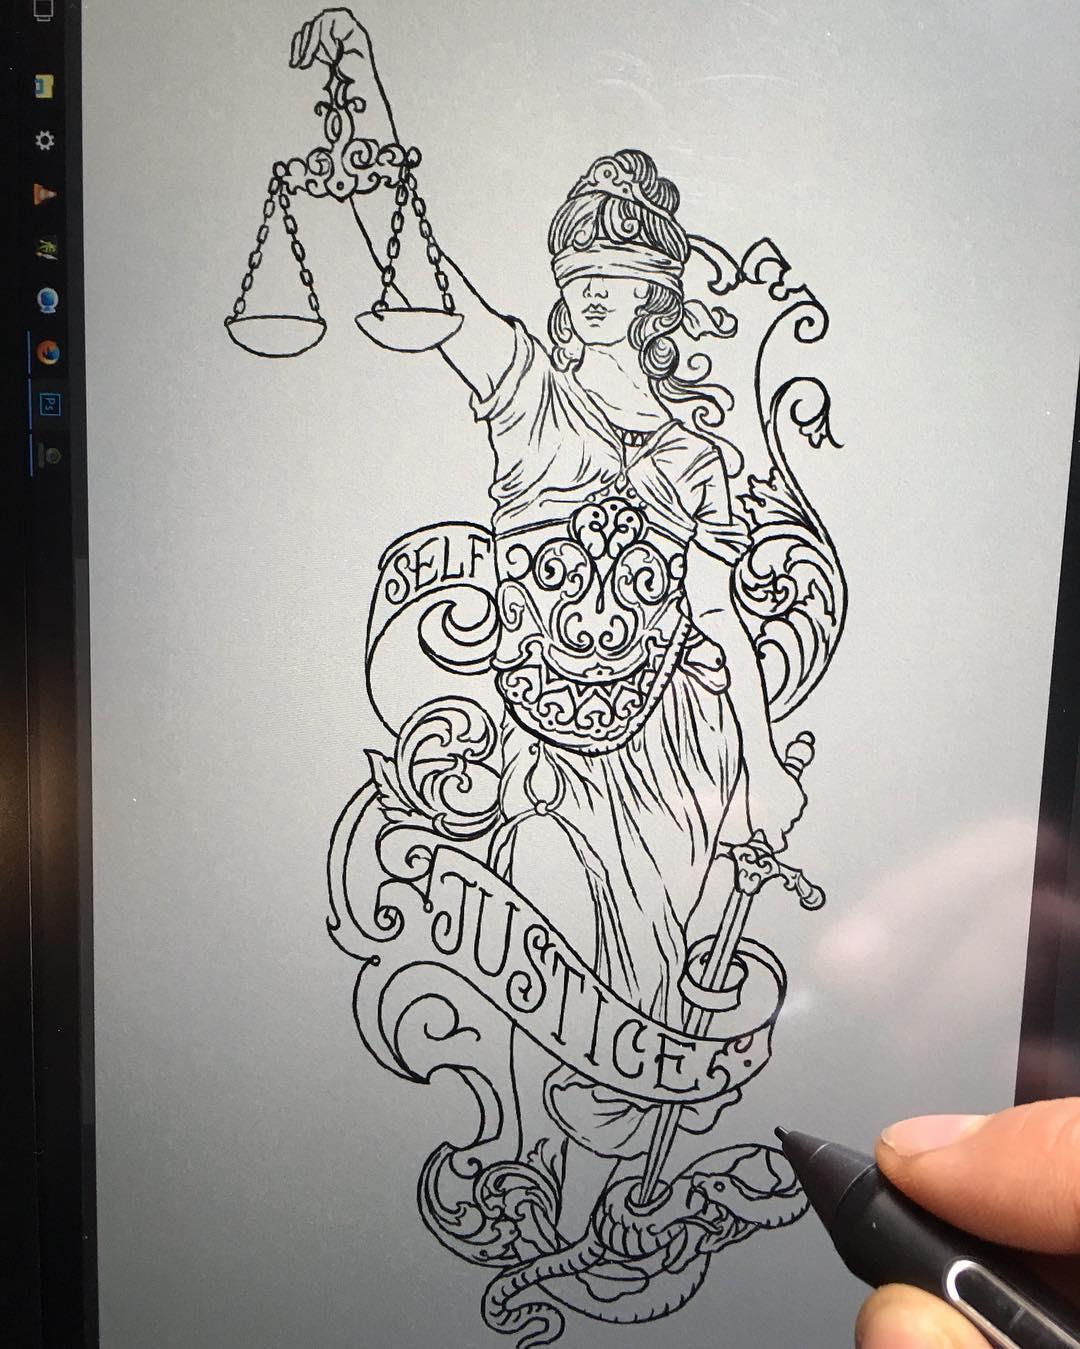 todays work sketch.. #matthiasblossfeld #handwerkinschriftundgravur #sideshowtra